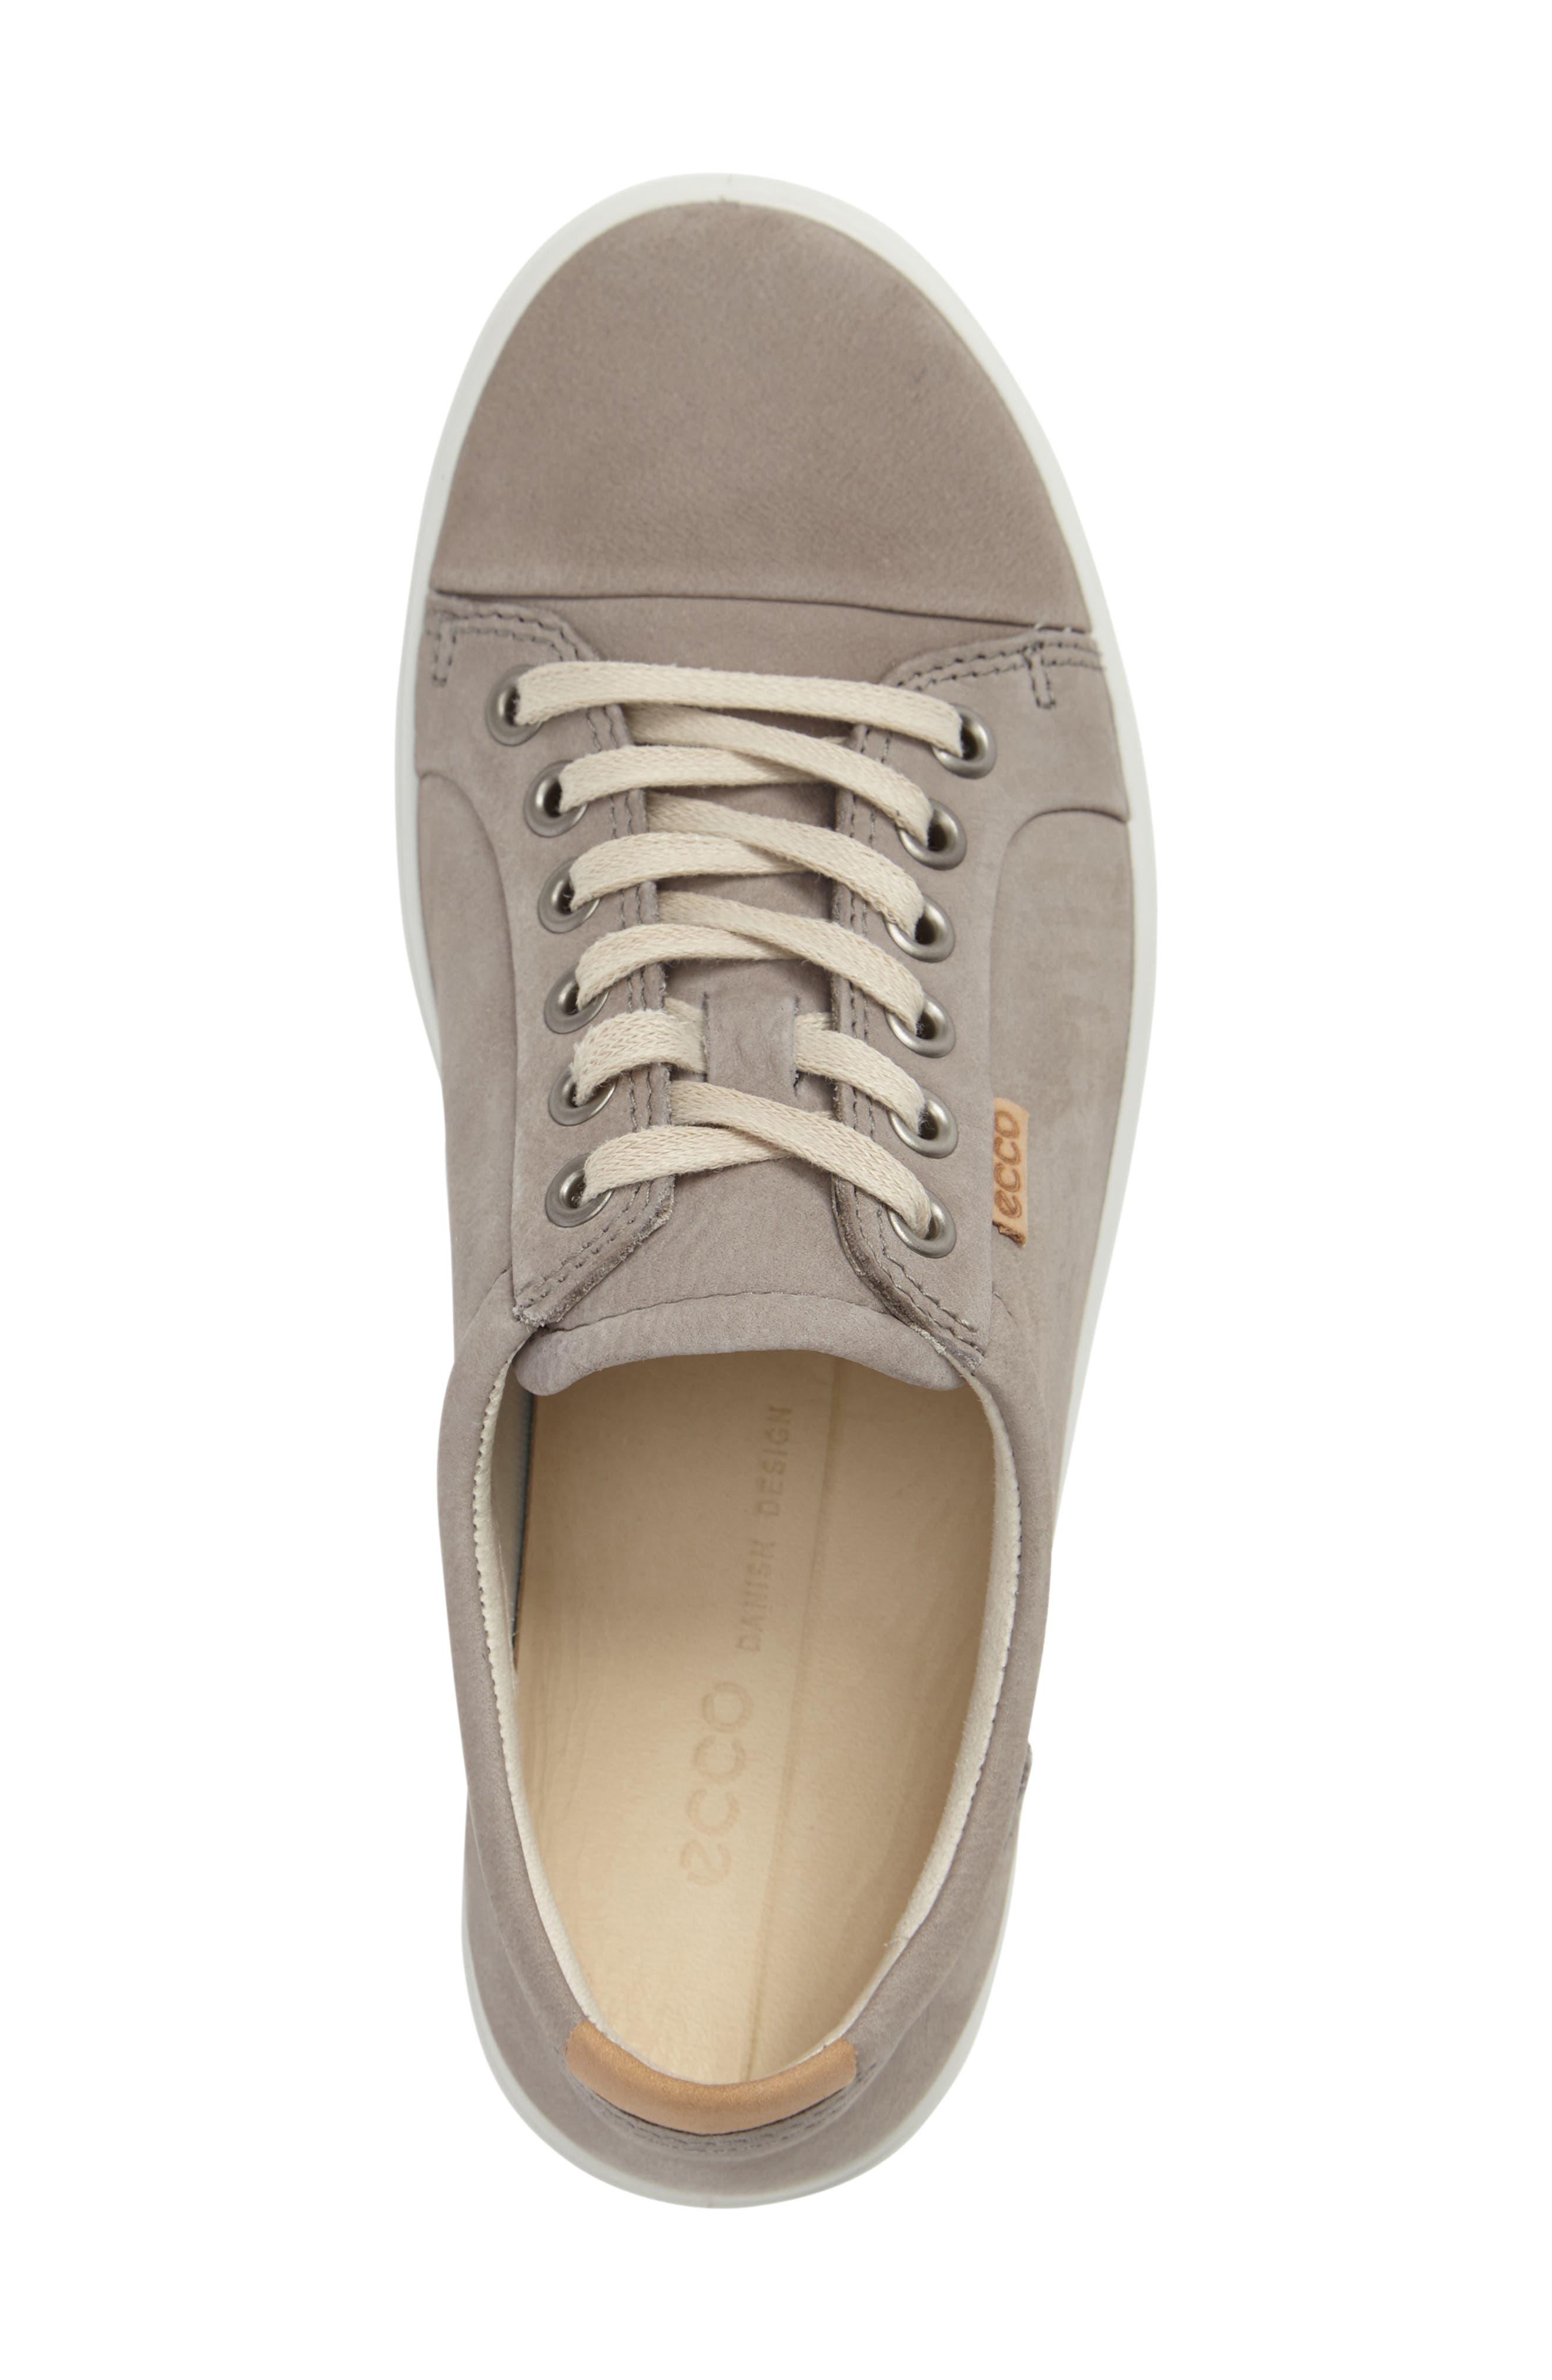 Alternate Image 3  - ECCO 'Soft 7' Cap Toe Sneaker (Women)